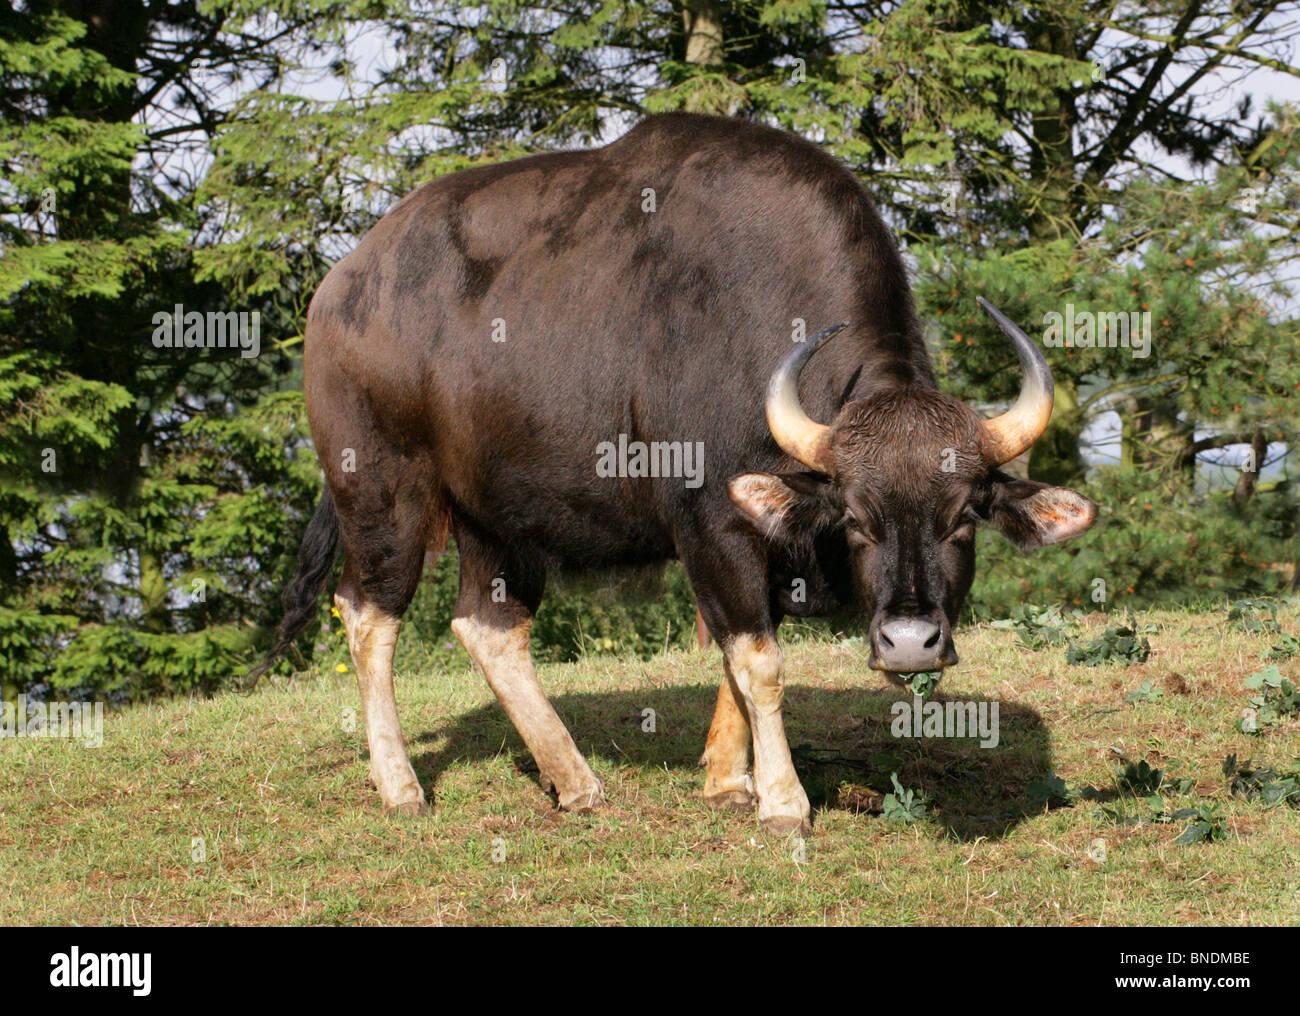 Female Gaur or Indian Bison, Bos gaurus (previously Bibos gauris), Bovinae, Bovidae. Large Asian Cattle. - Stock Image